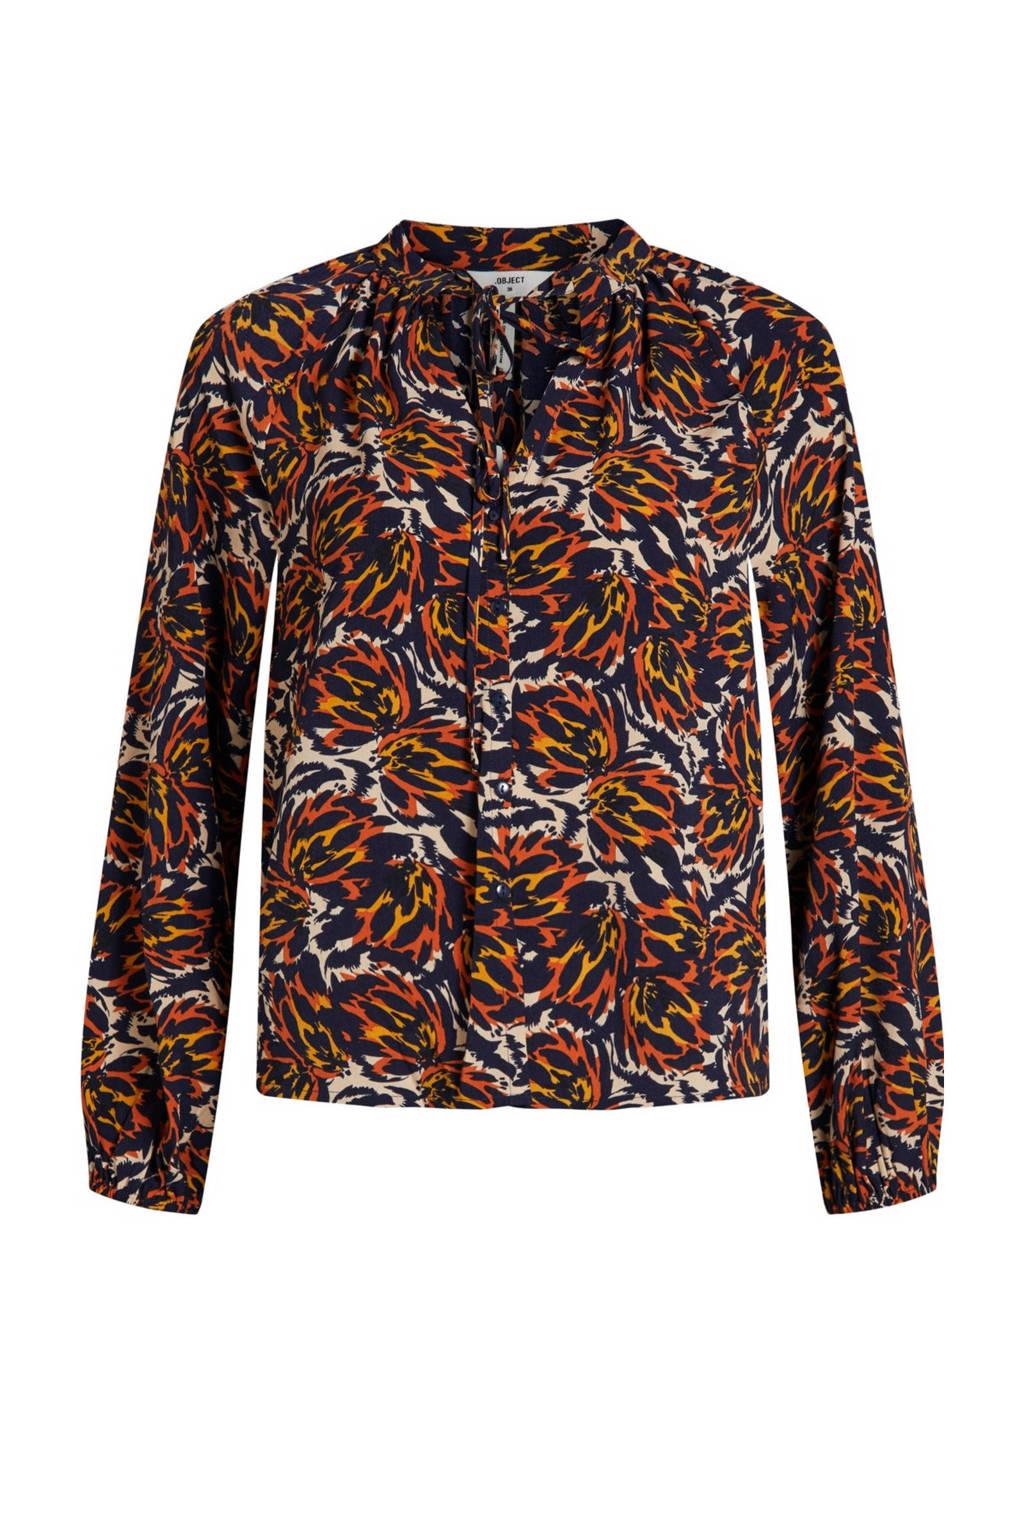 OBJECT blouse OBJKAT met all over print ecru/blauw/rood, Ecru/blauw/rood